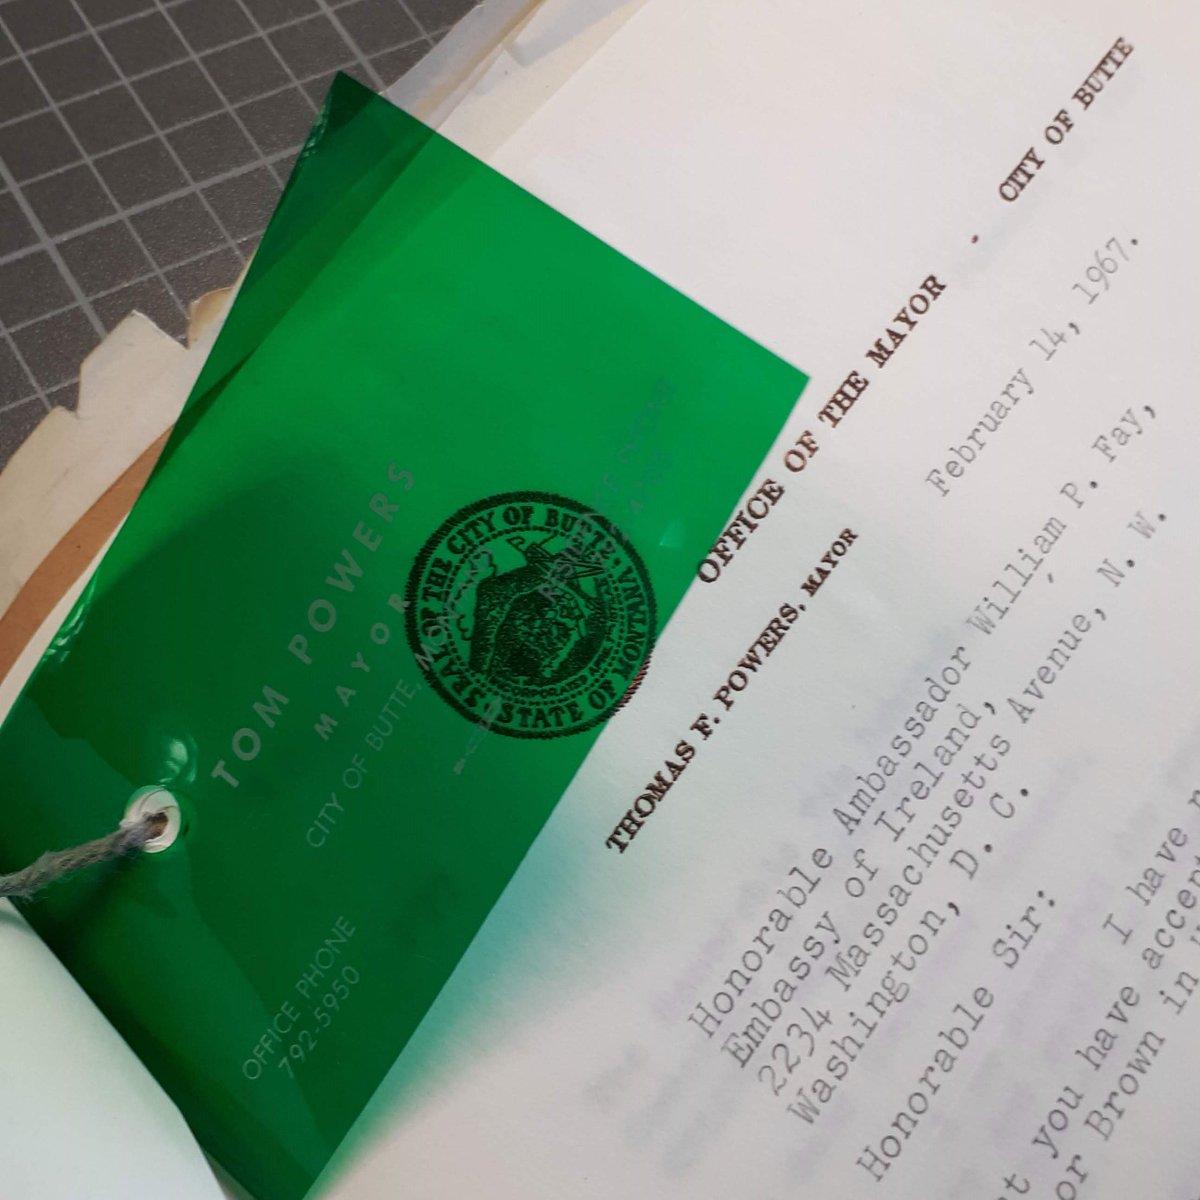 Dictionary of Irish Biography | Royal Irish Academy